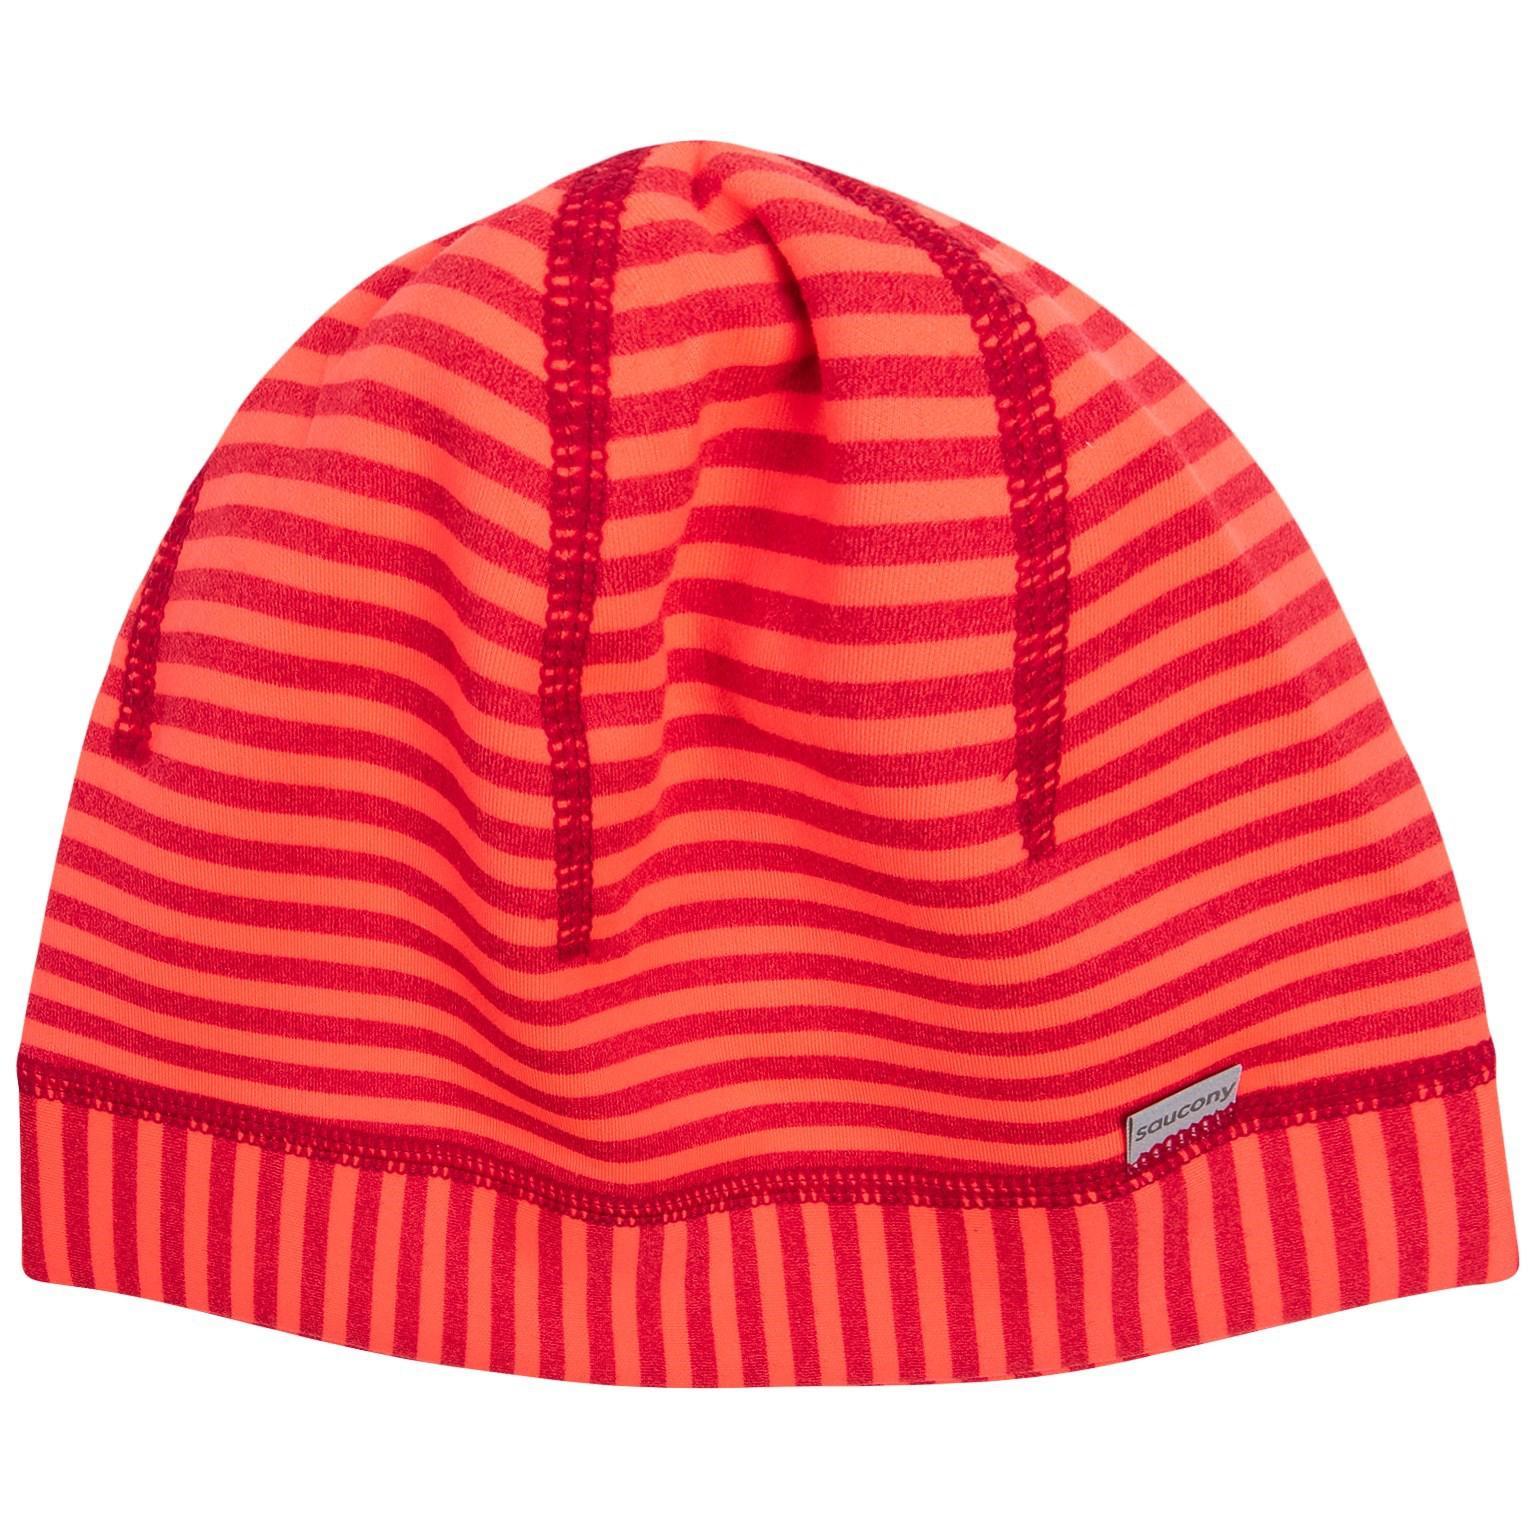 9acb78cba12 Lyst - Saucony Brisk Skull Cap Hat in Red